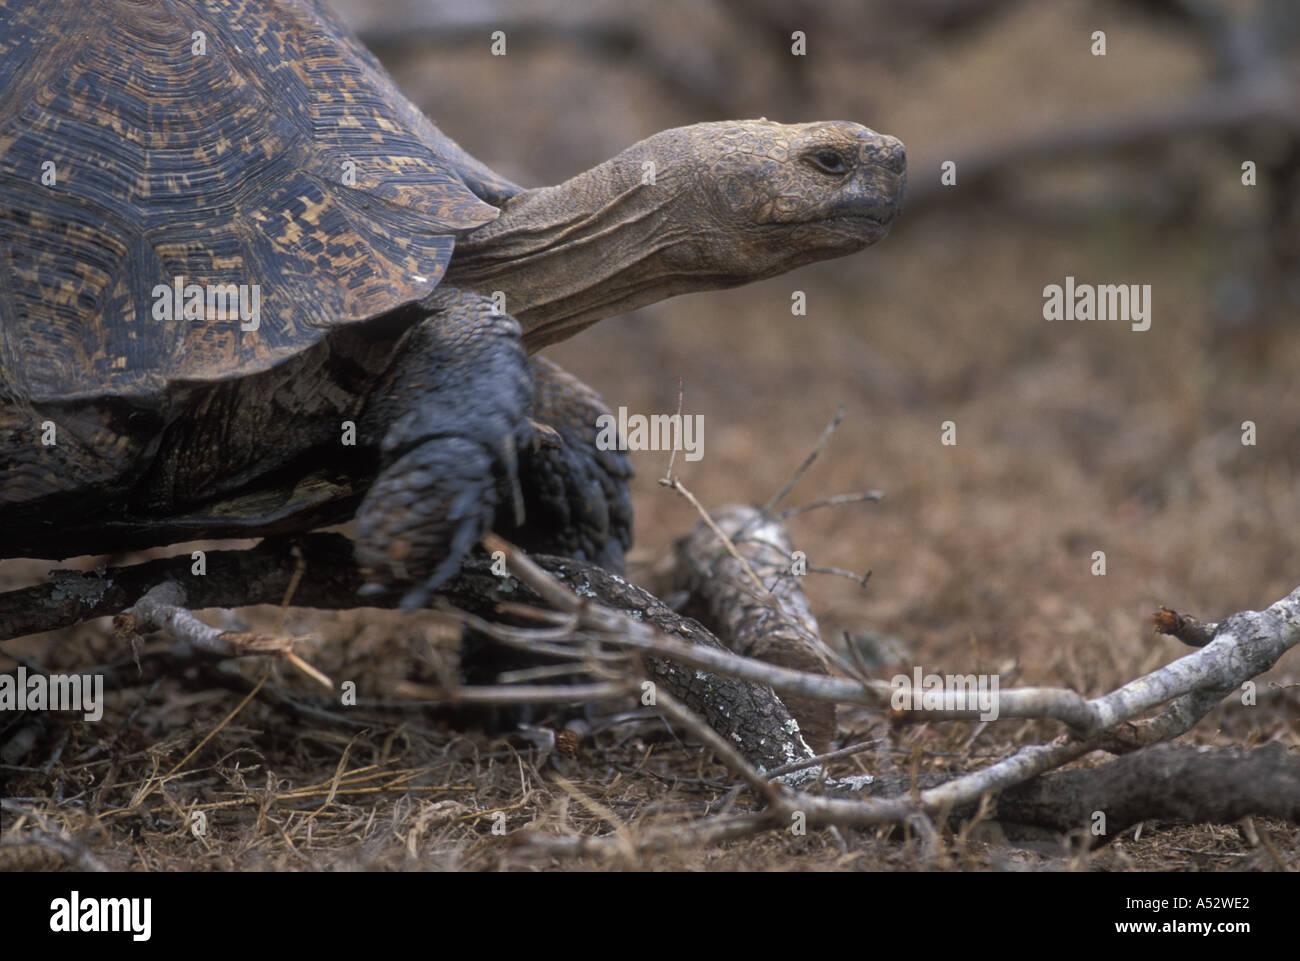 South Africa Addo Elephant National Park Leopard Tortoise Geochelone pardalis slowly walking - Stock Image